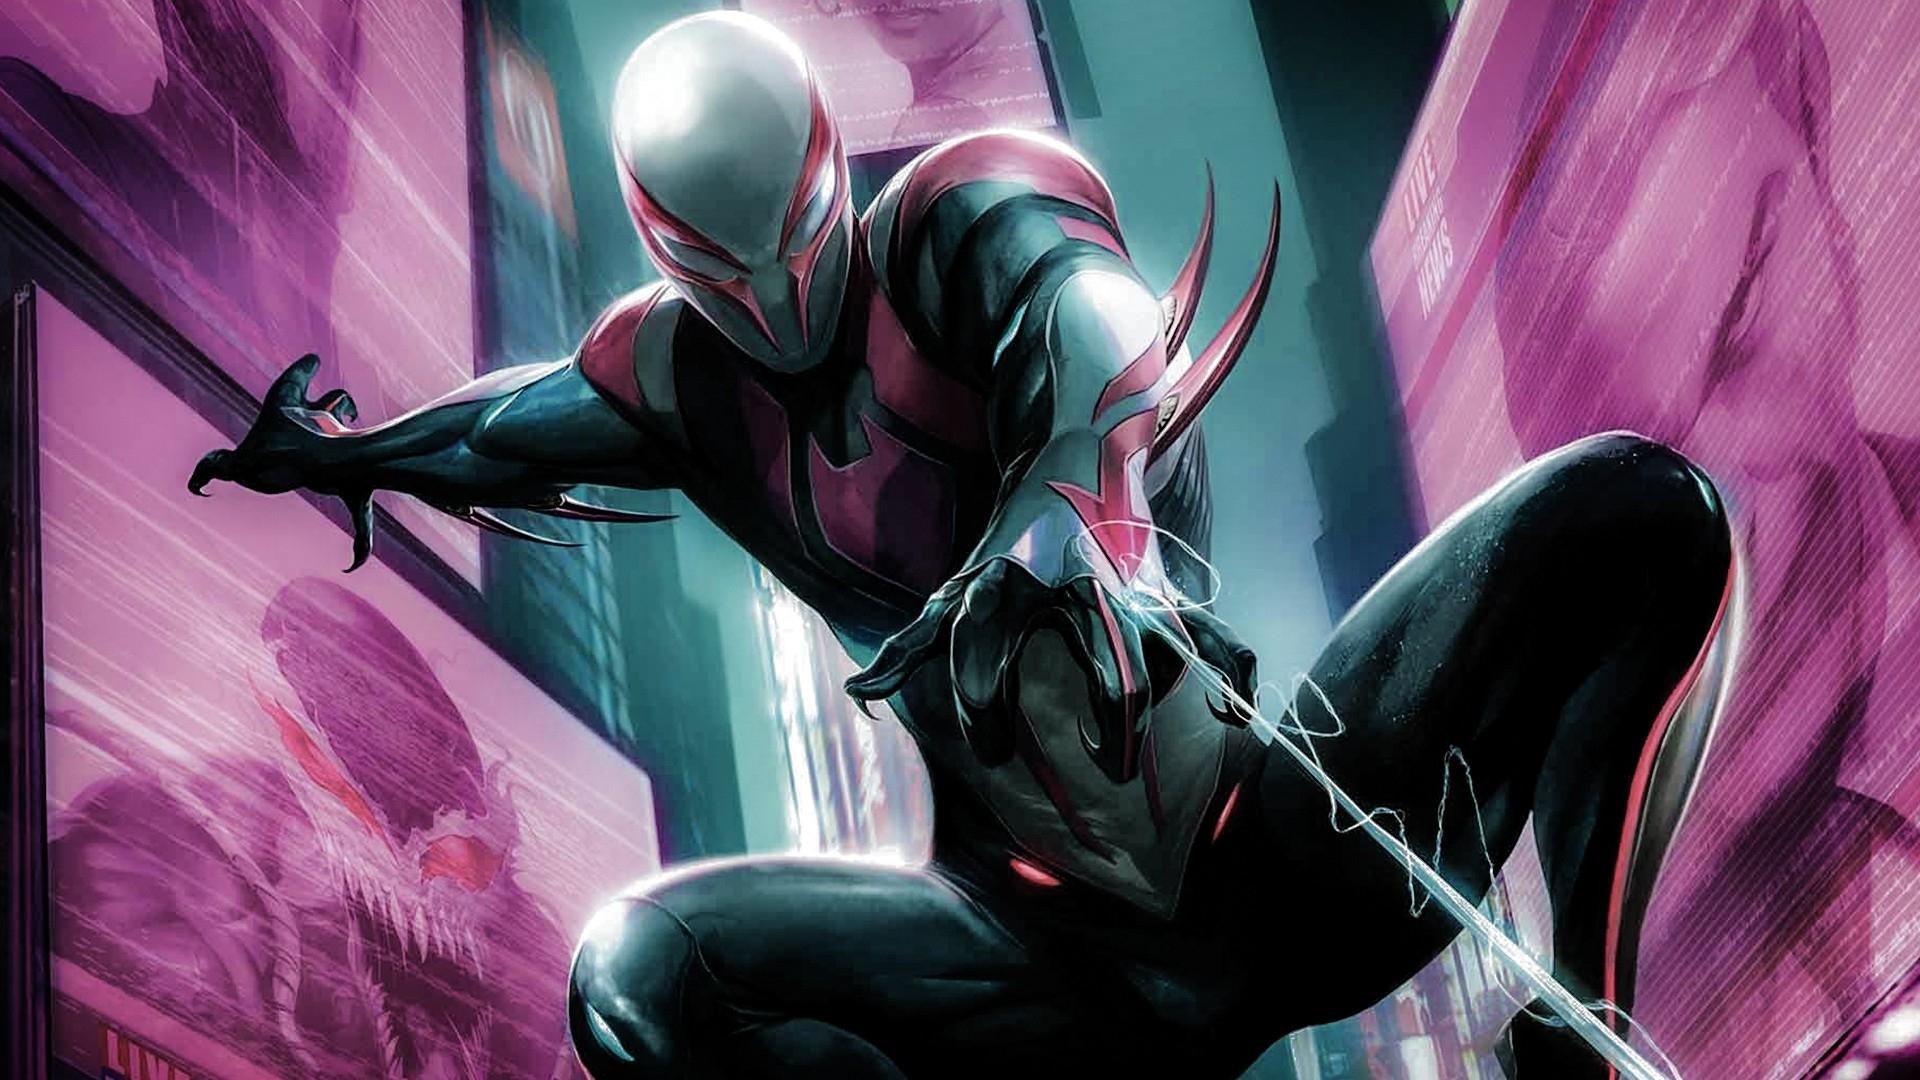 10 Best Spider Man 2099 Wallpaper Hd Full Hd 1920 1080 For